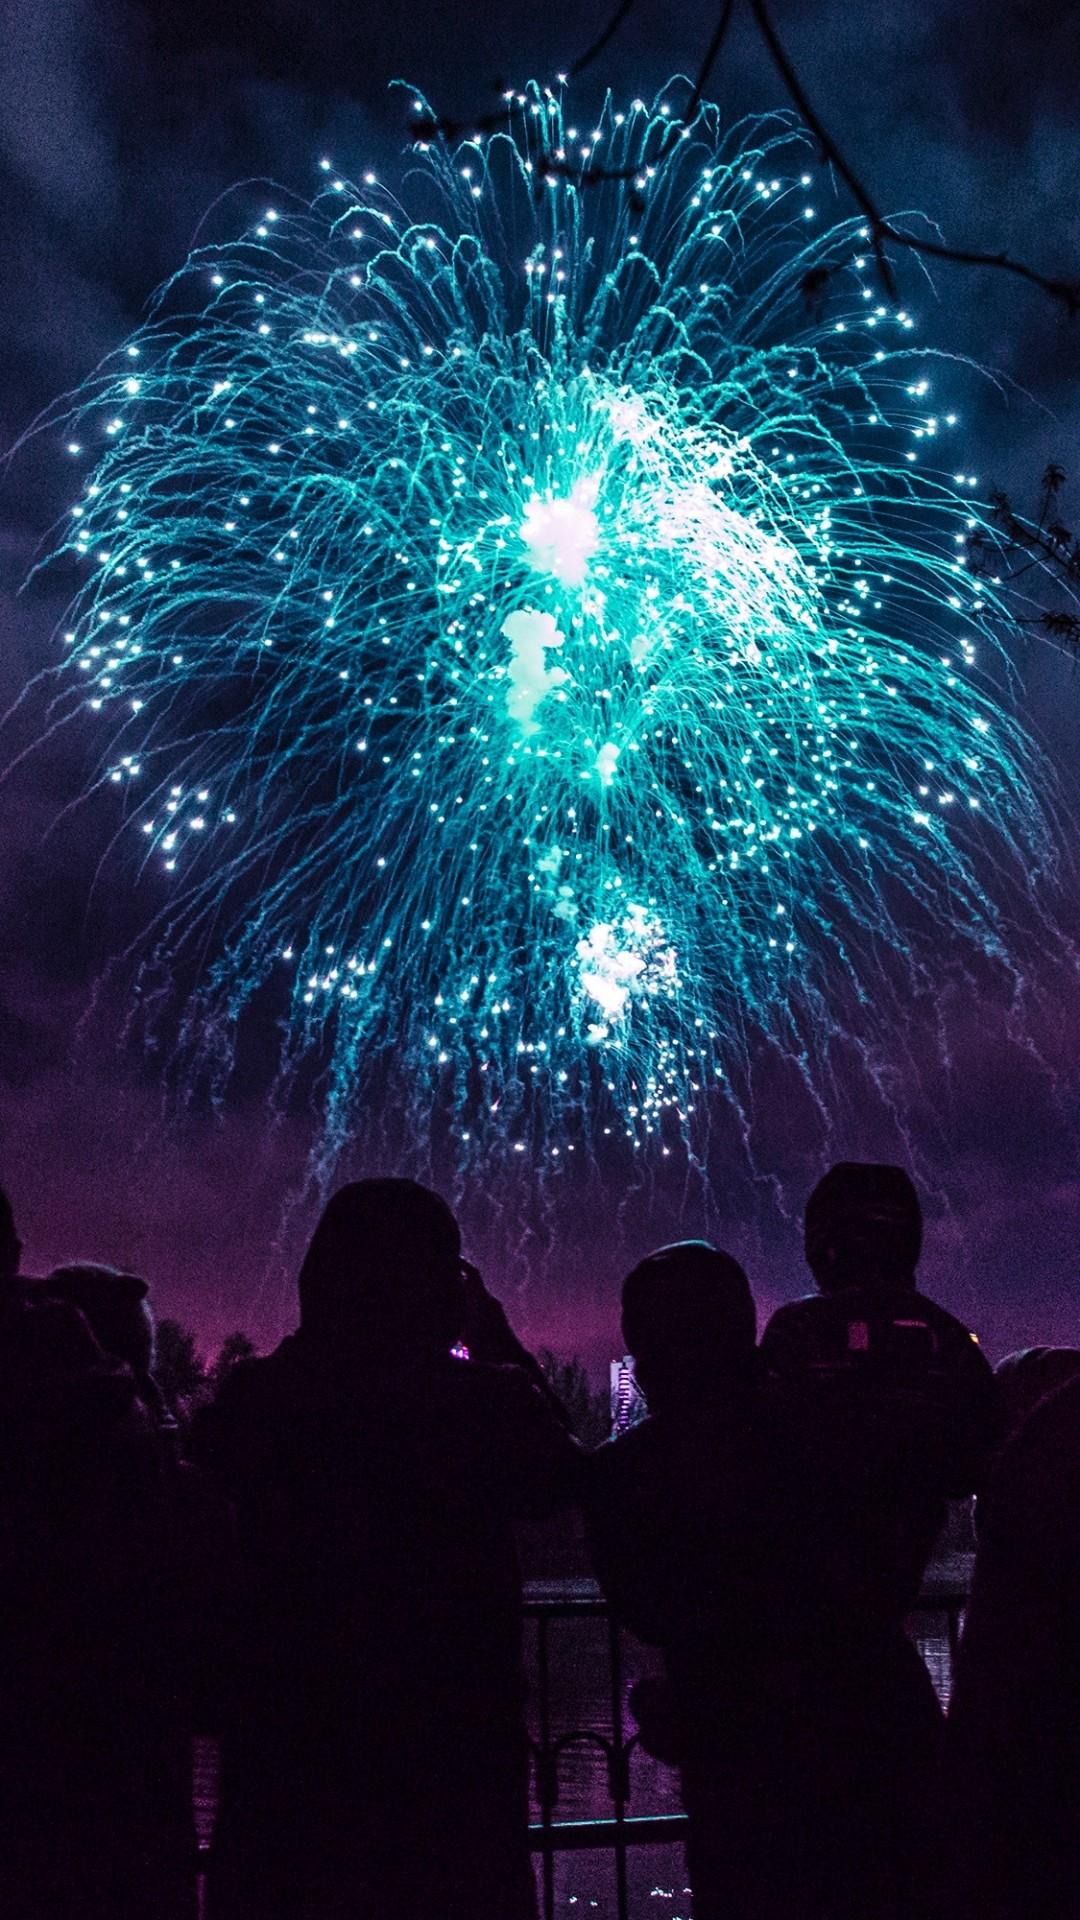 Free Fireworks phone wallpaper by damonneath